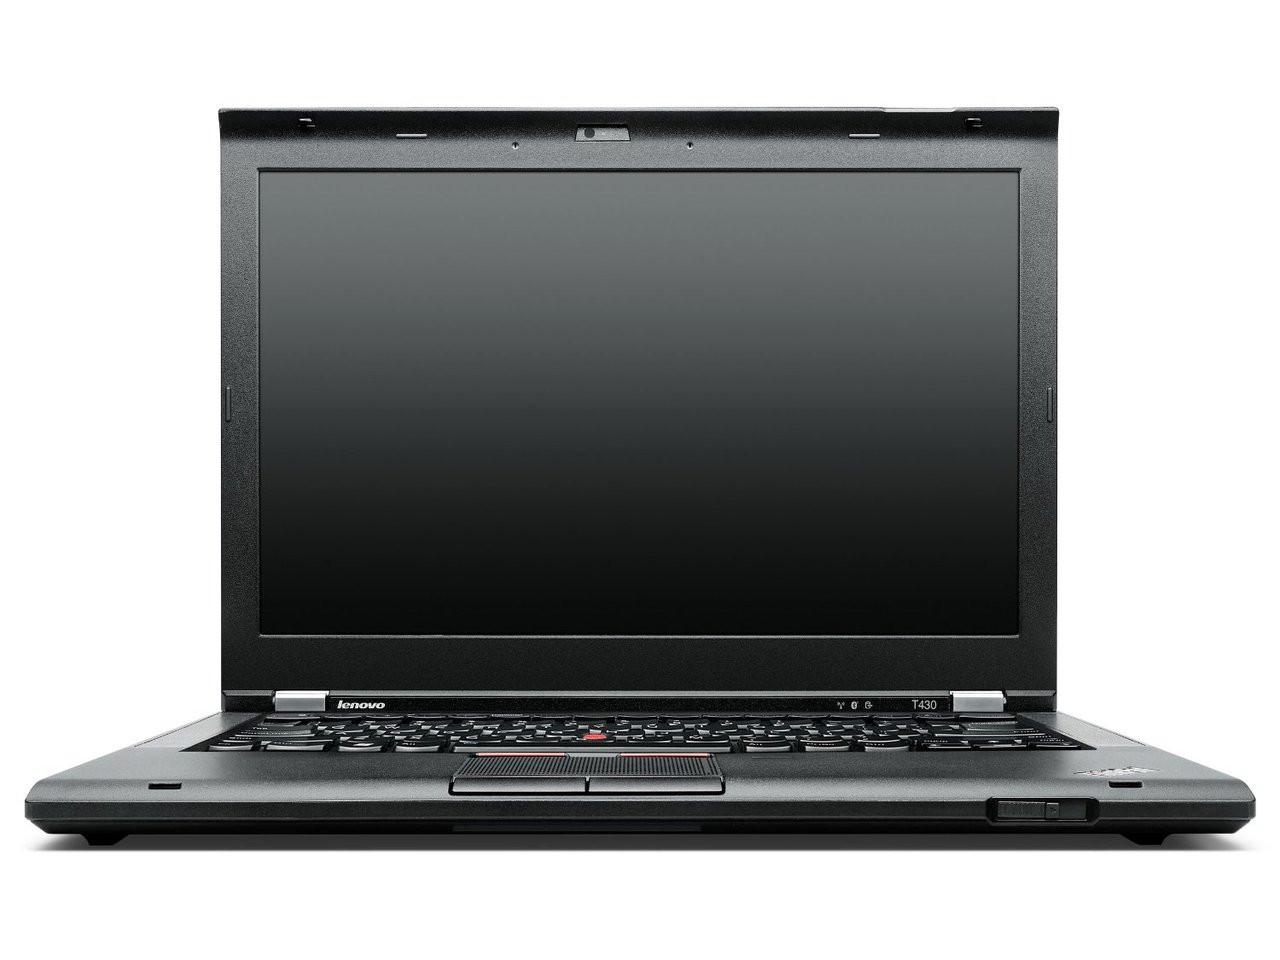 Lenovo Thinkpad T430s - Core i7 (Configure to Order)